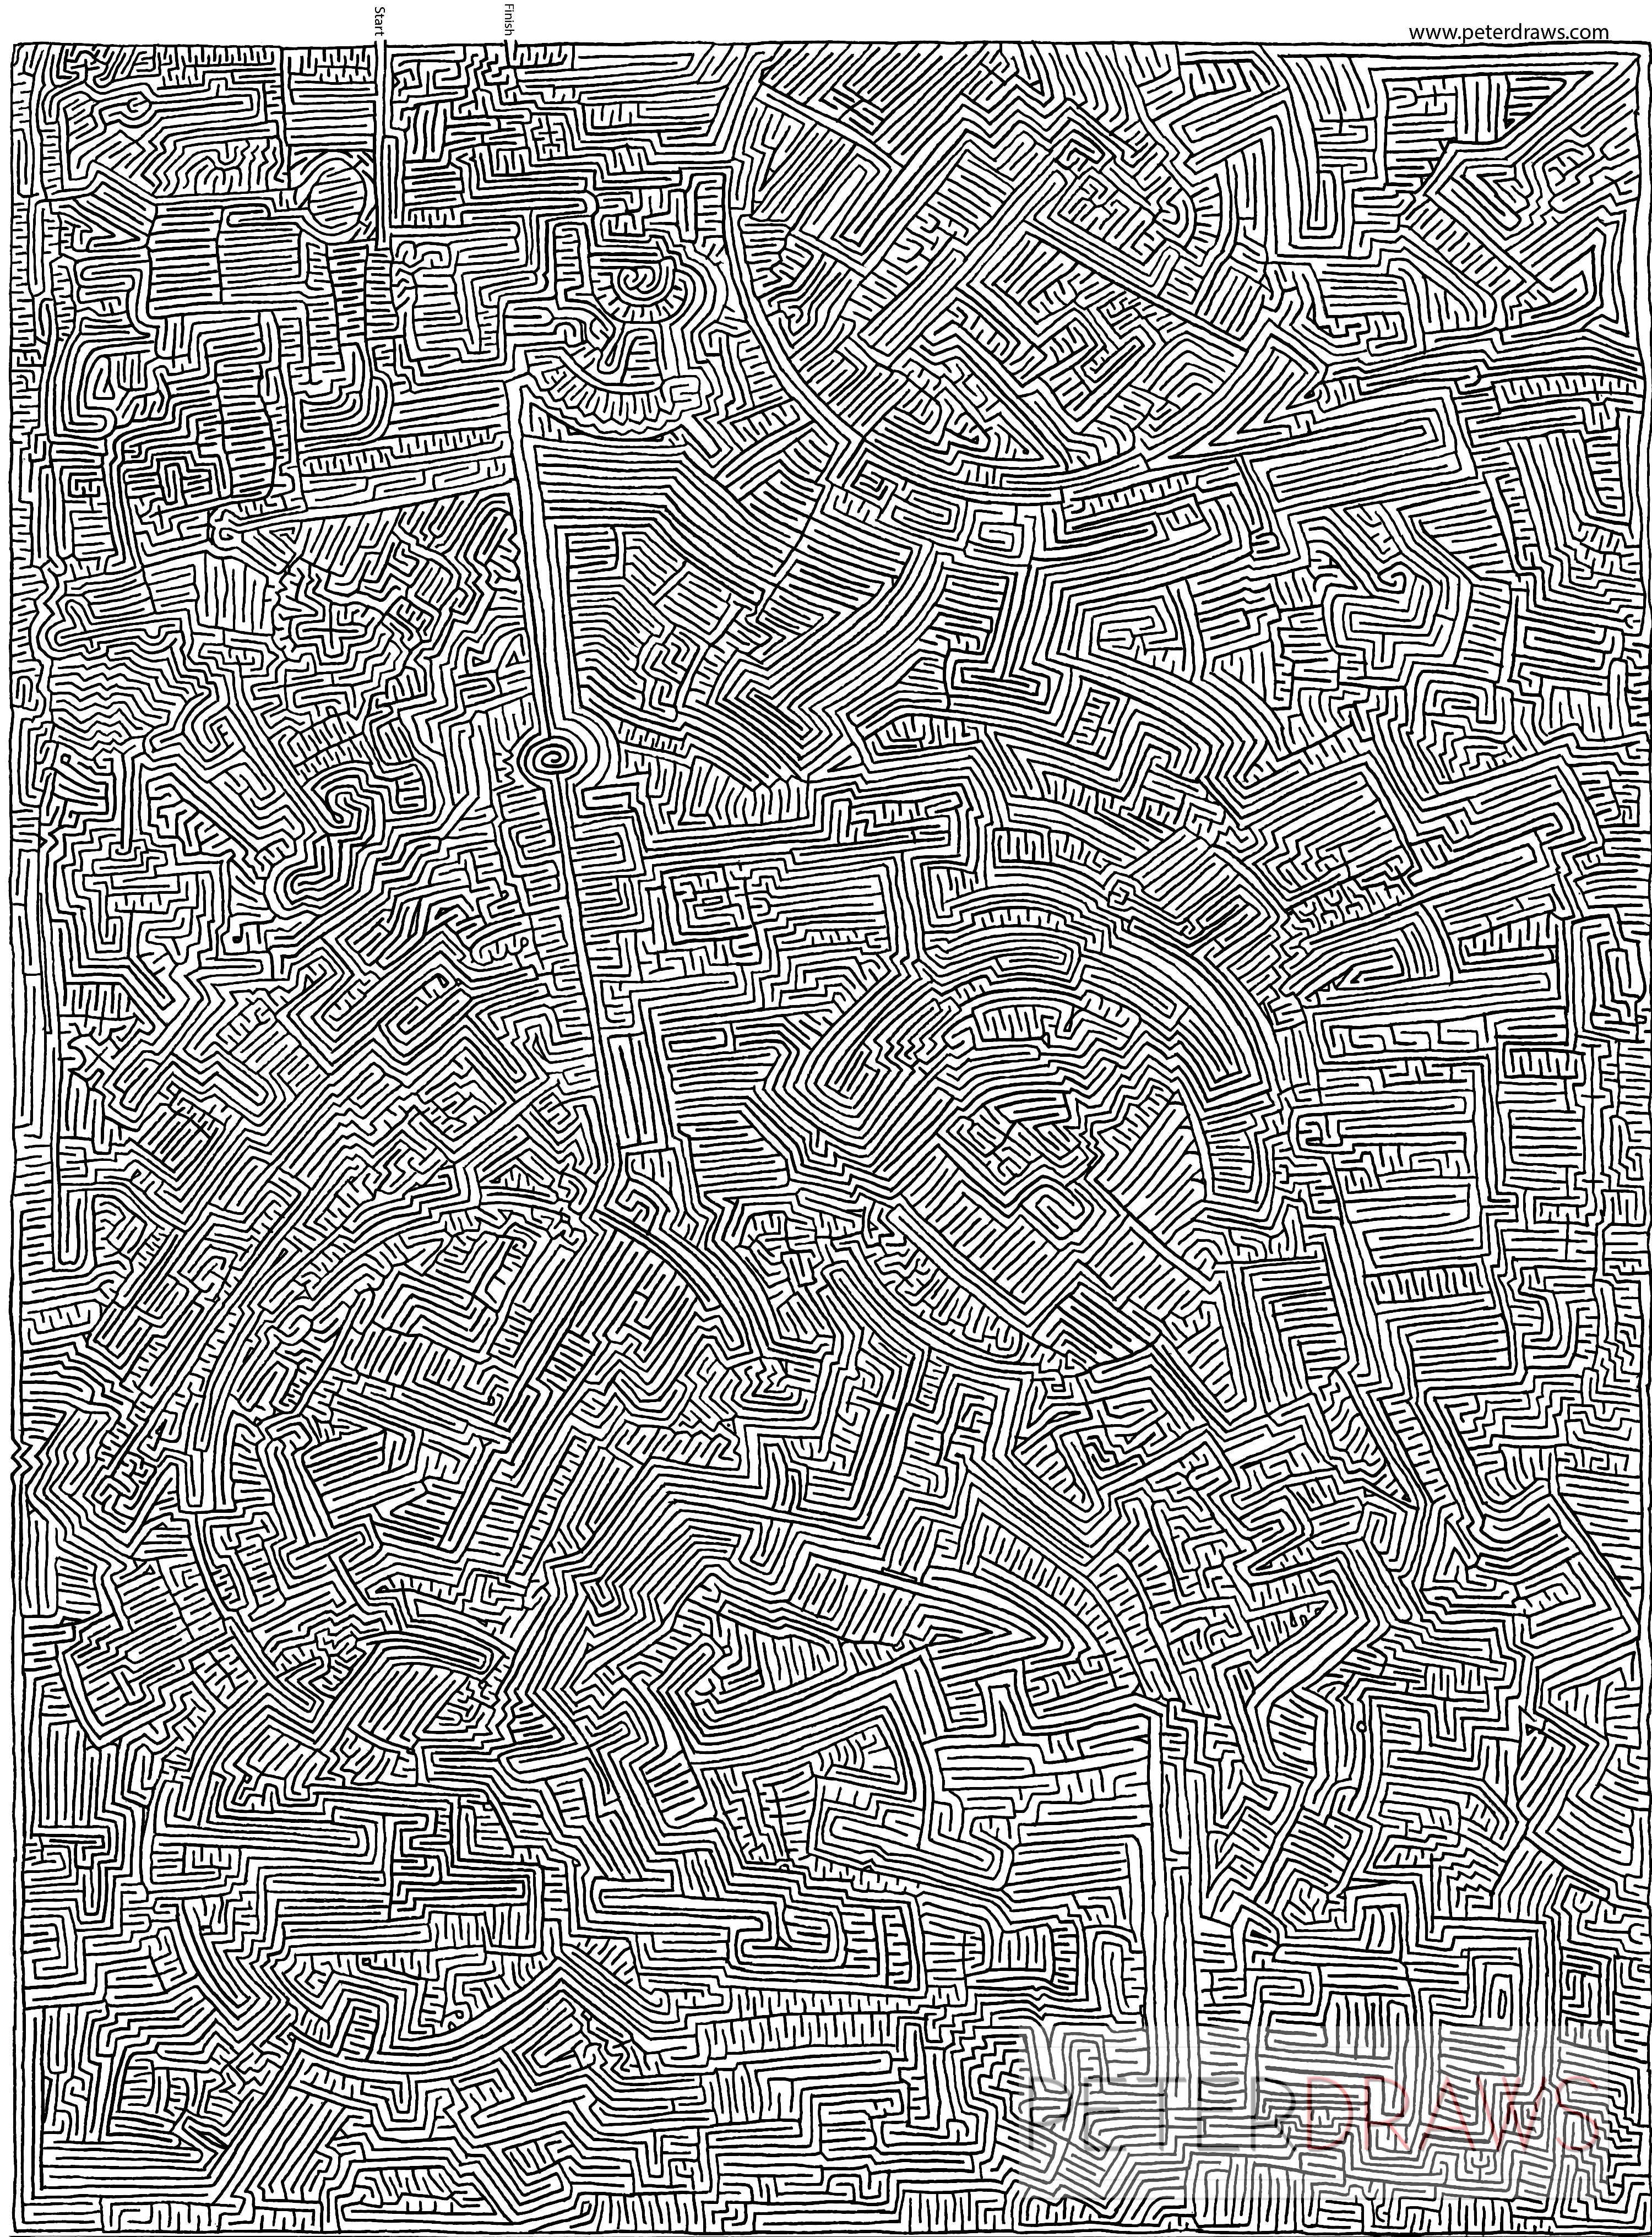 Drawn maze pencil January several maze Free 3rd